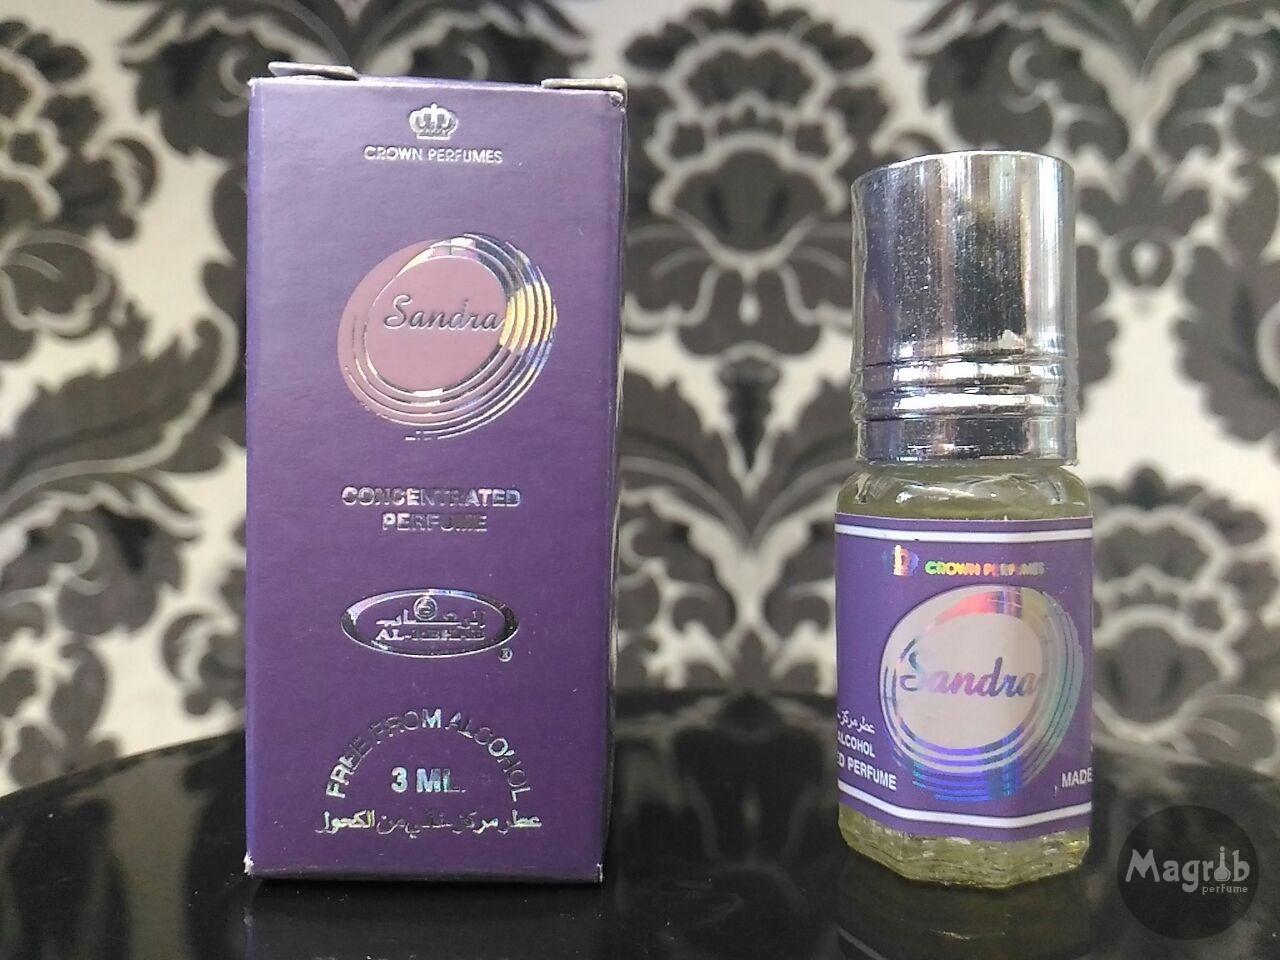 Al-Rehab Sandra 3ml - женские масляные духи